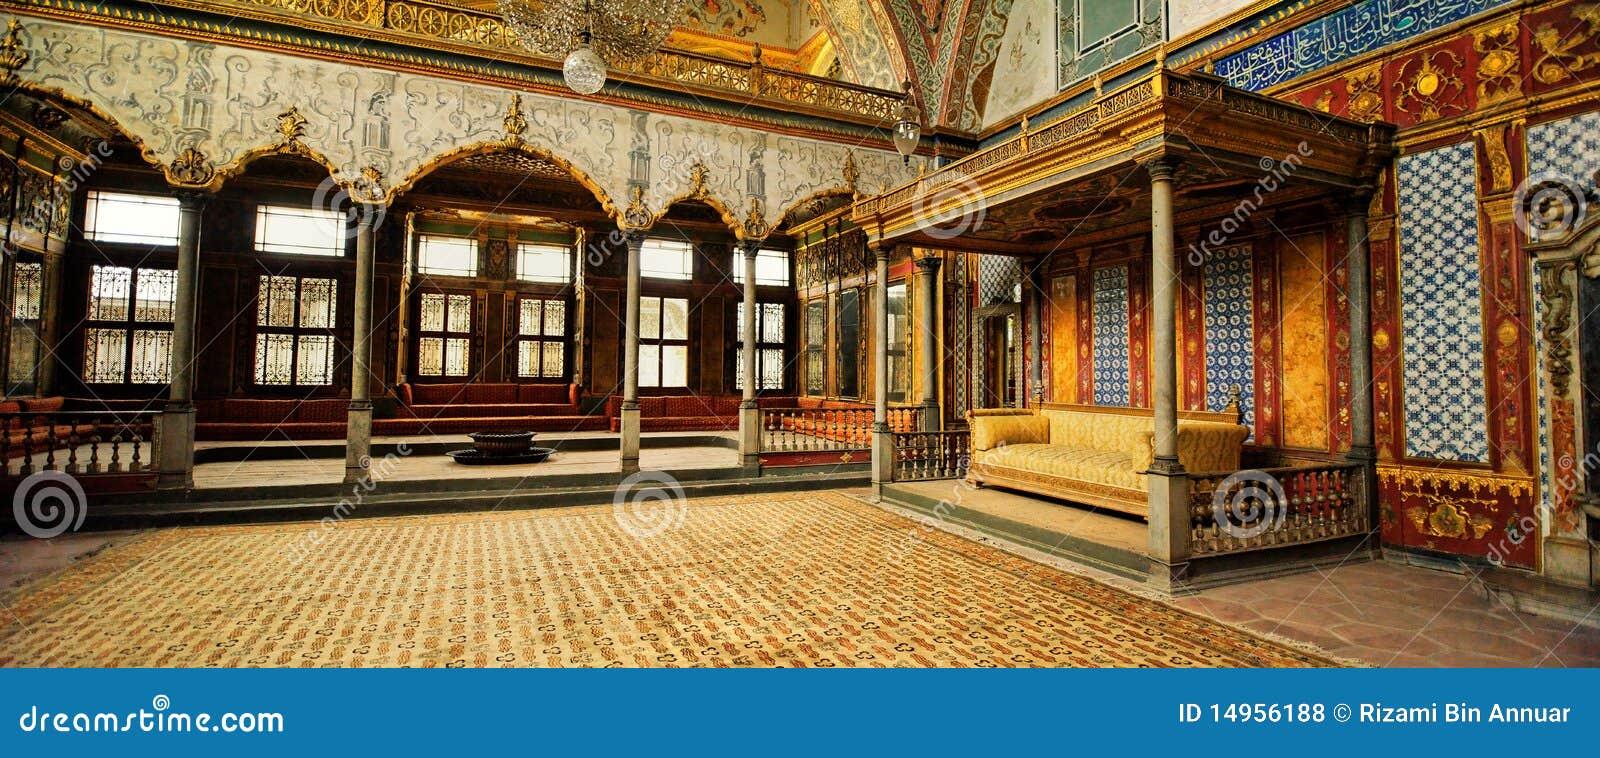 Harem nel palazzo di Topkapi, Costantinopoli, Turchia